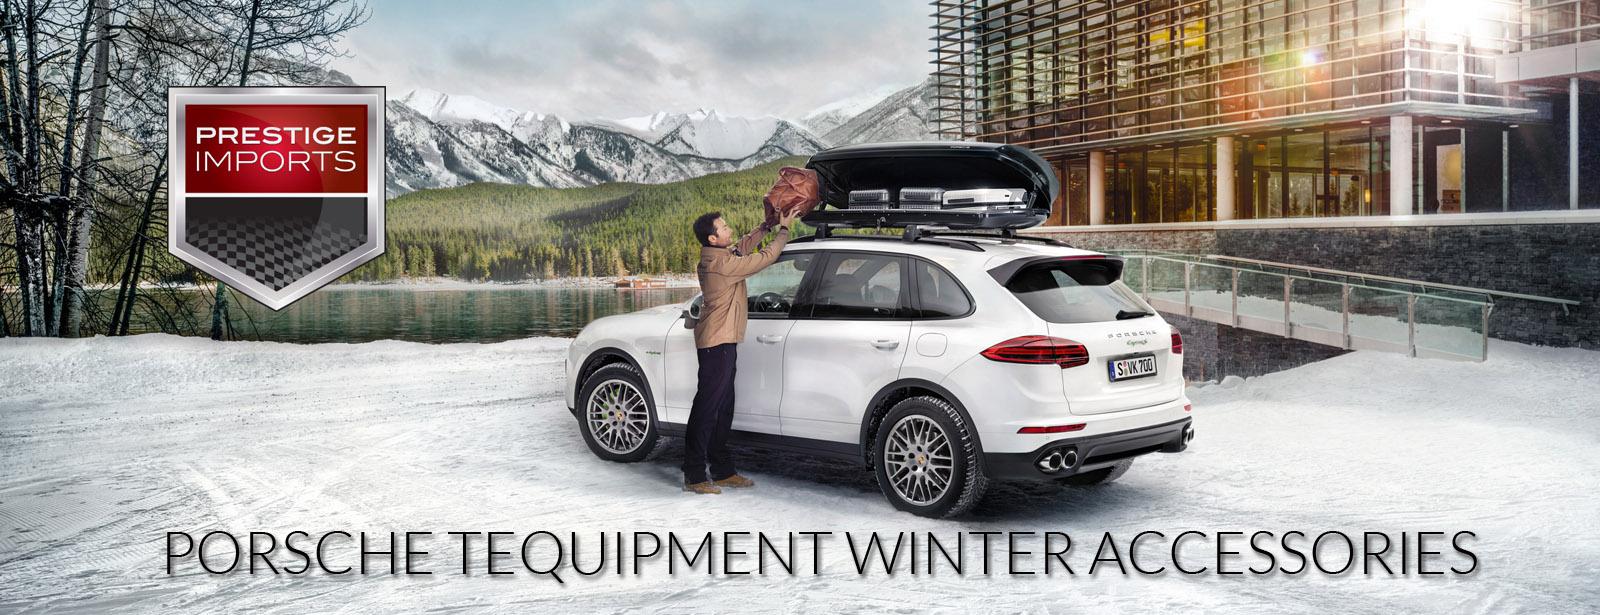 Porsche tequipment winter accessories at prestige imports publicscrutiny Choice Image